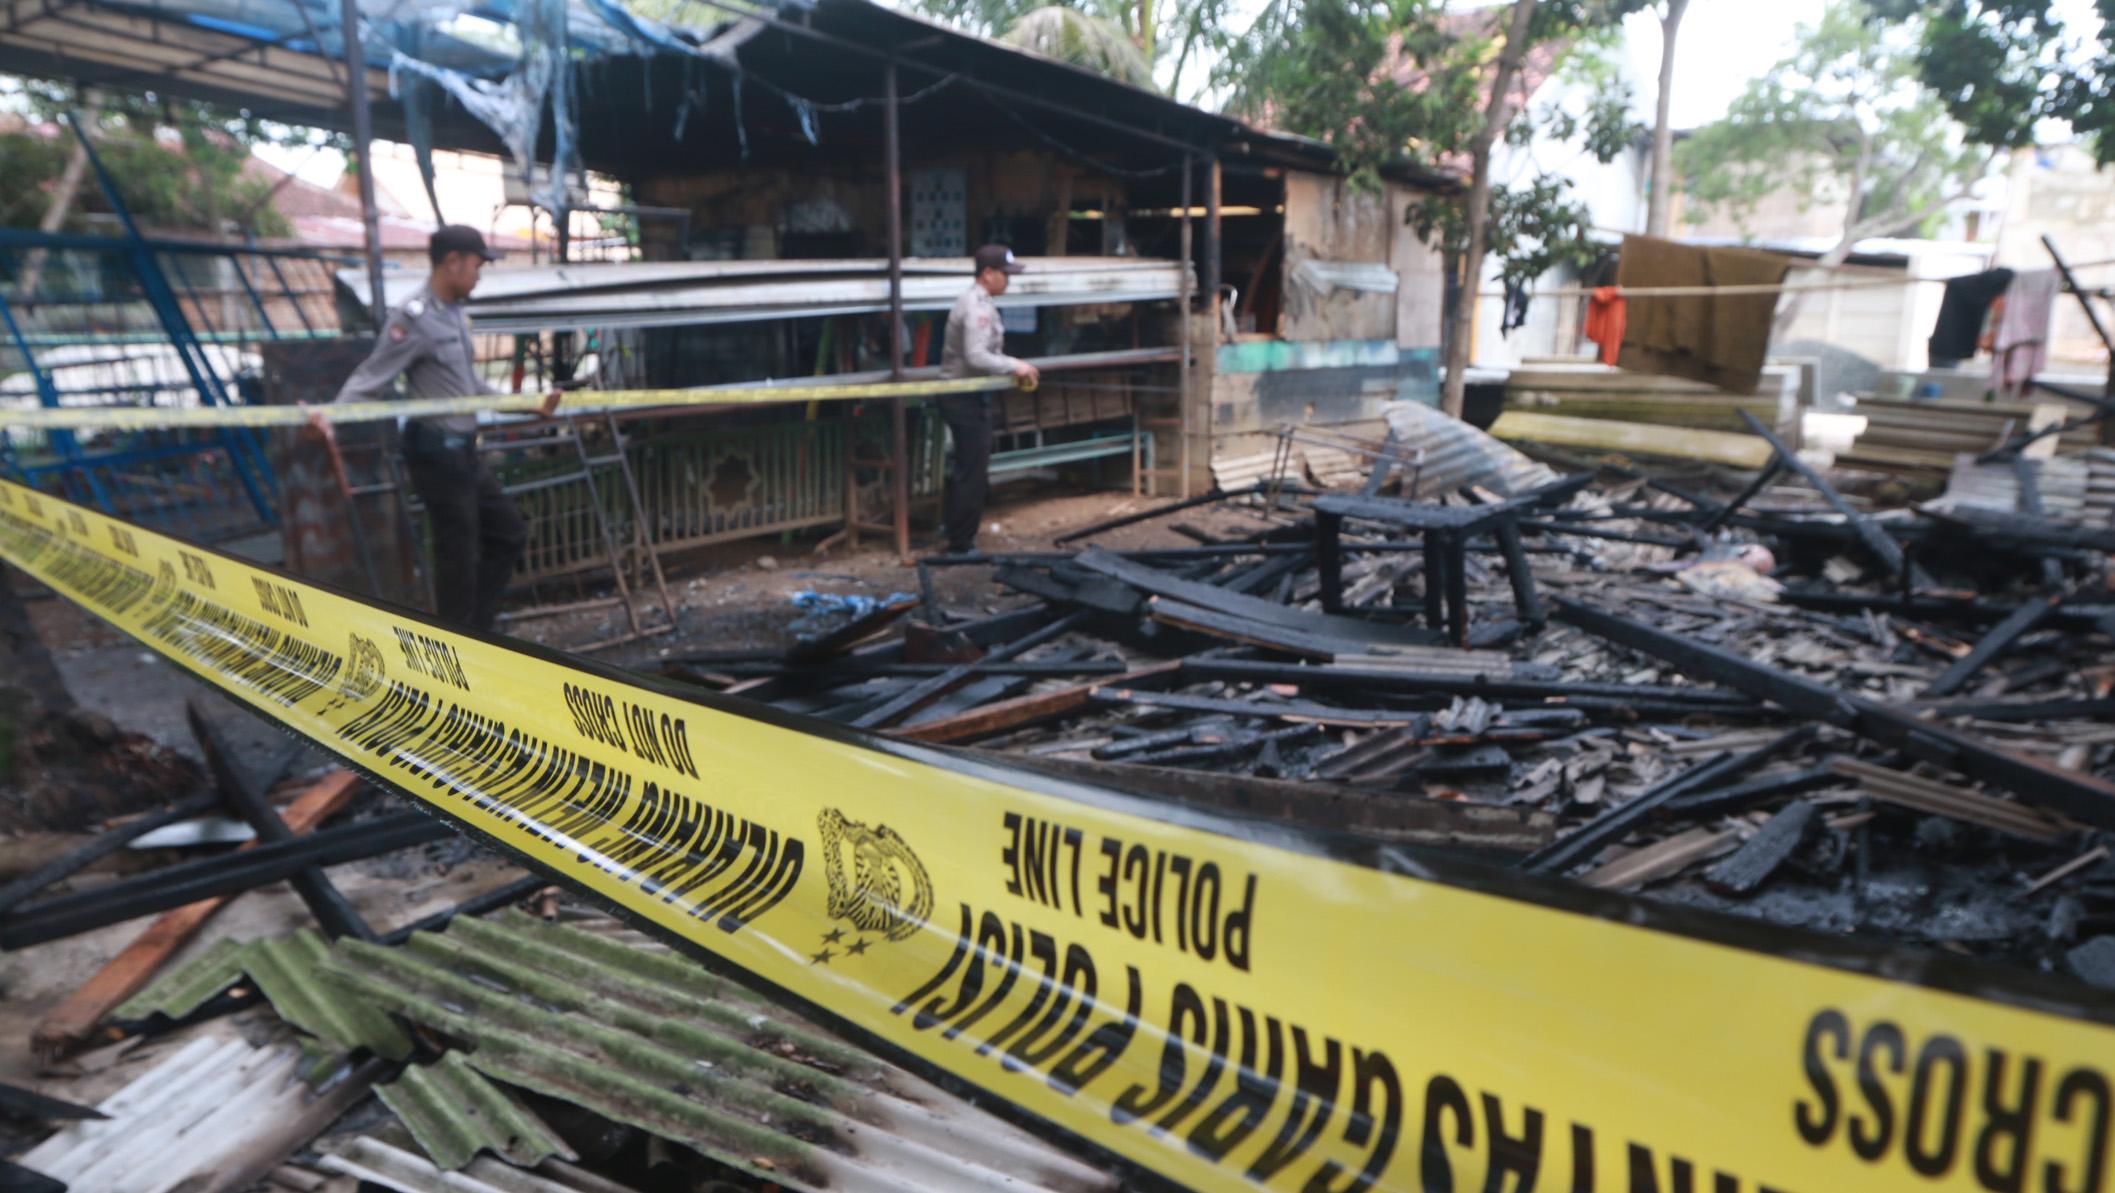 Polisi memasang police line di area kios yang terbakar di Jalan Untung Suropati, Labuhan Ratu, Rabu (10/1). (Lampungnews.com/El Shinta)